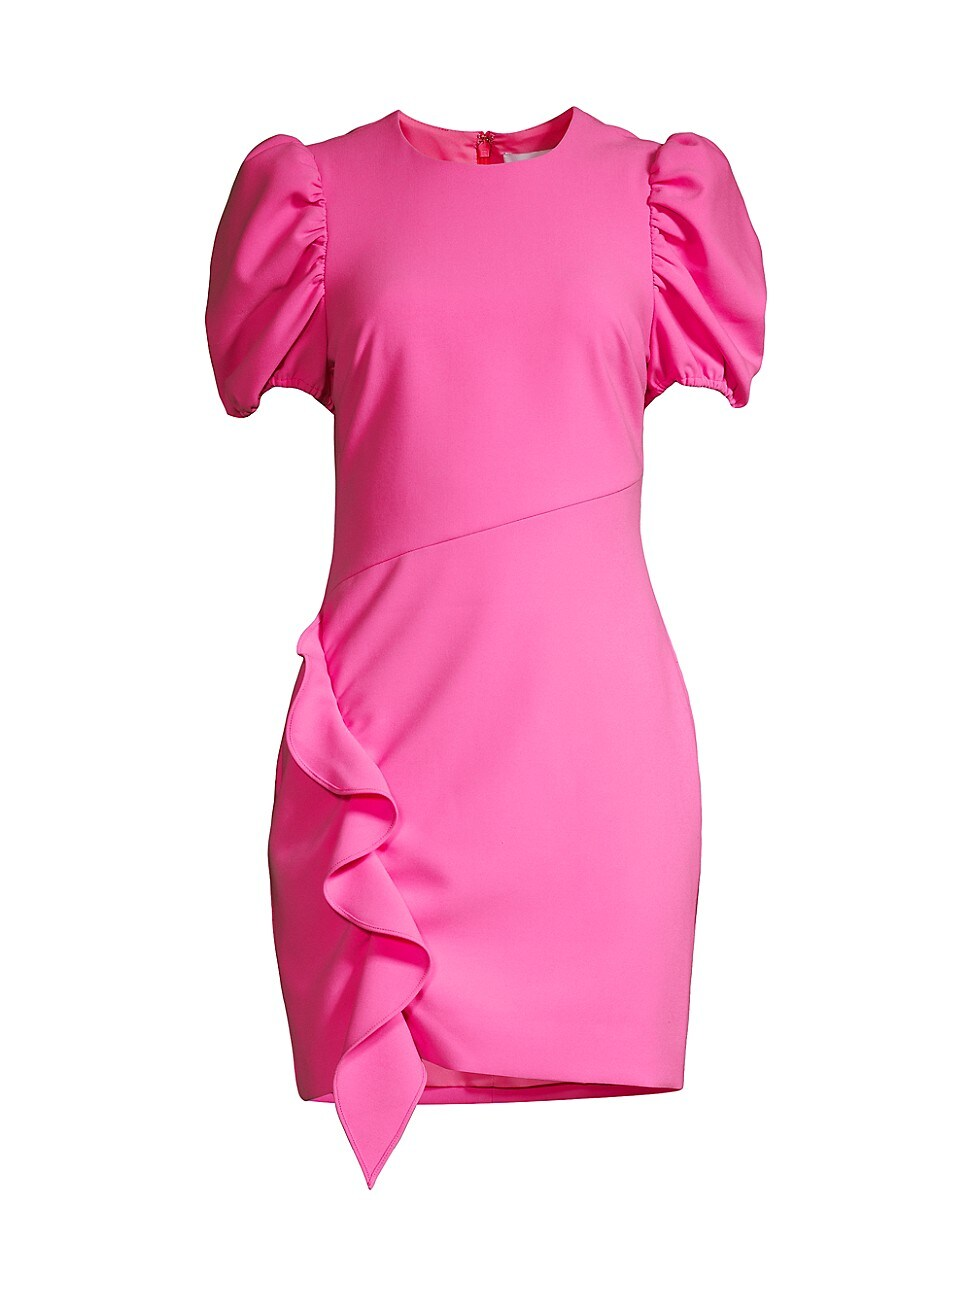 Likely WOMEN'S MALTA PUFF-SLEEVE RUFFLE SHEATH DRESS